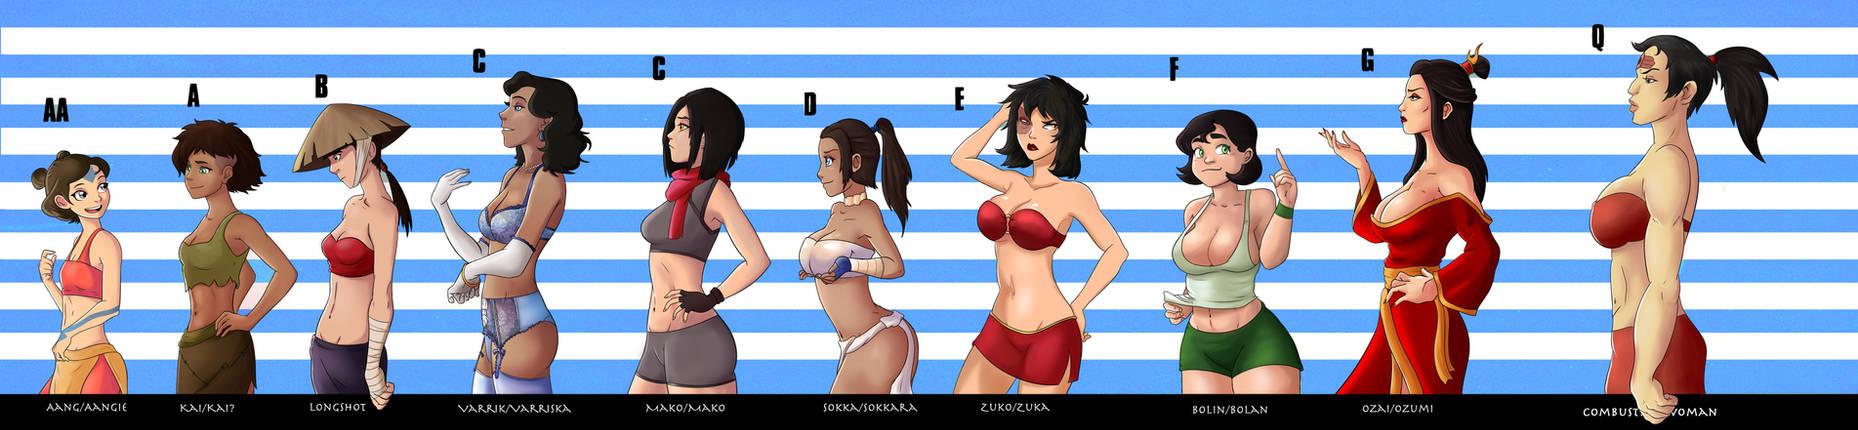 Rule 63 Breast Size Chart - AVATAR